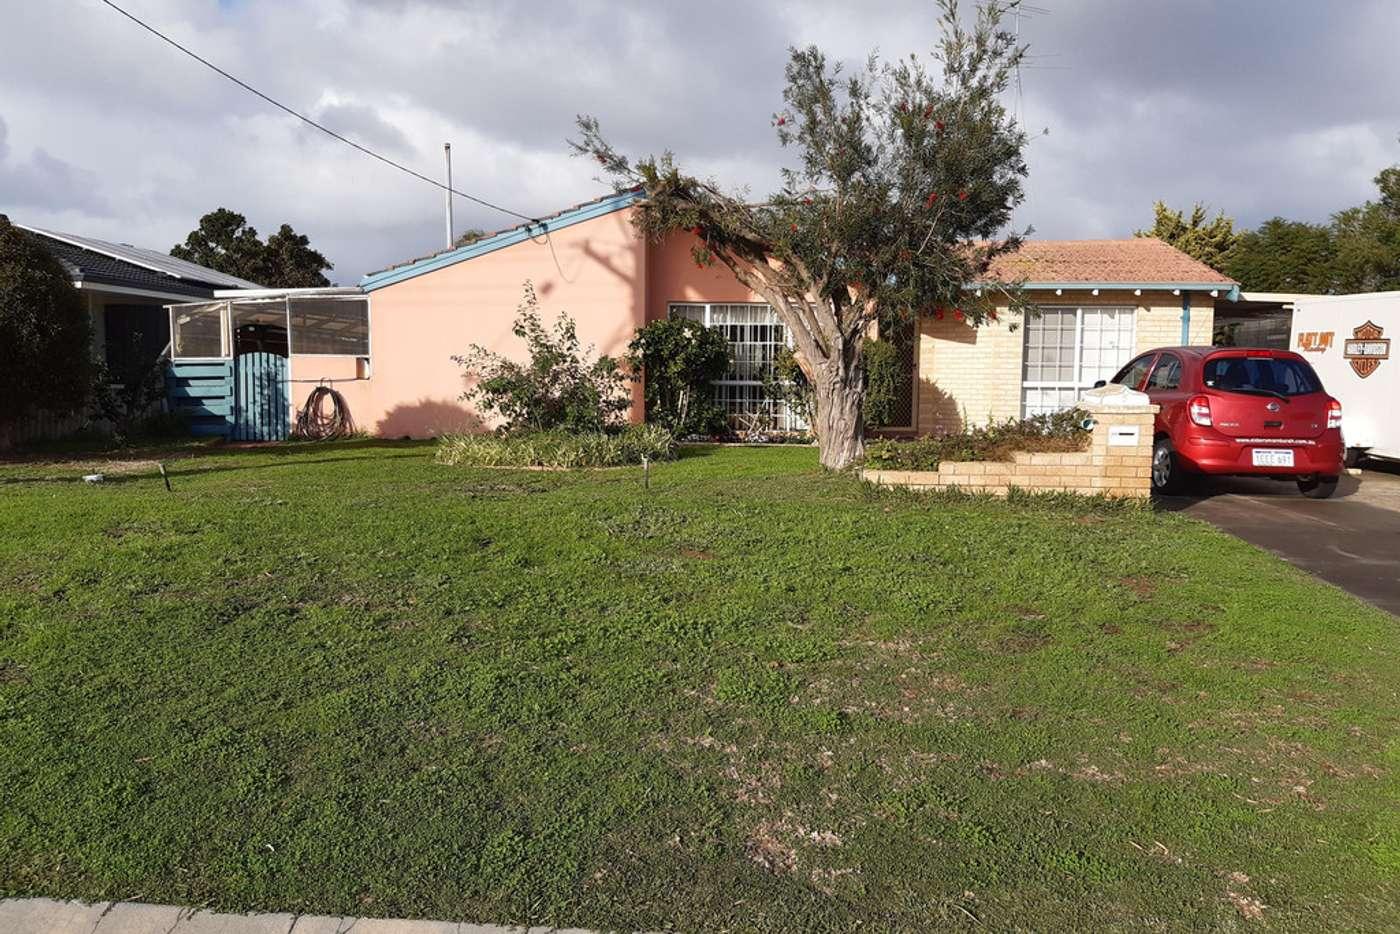 Main view of Homely house listing, 5 Luckhurst Drive, Mandurah WA 6210